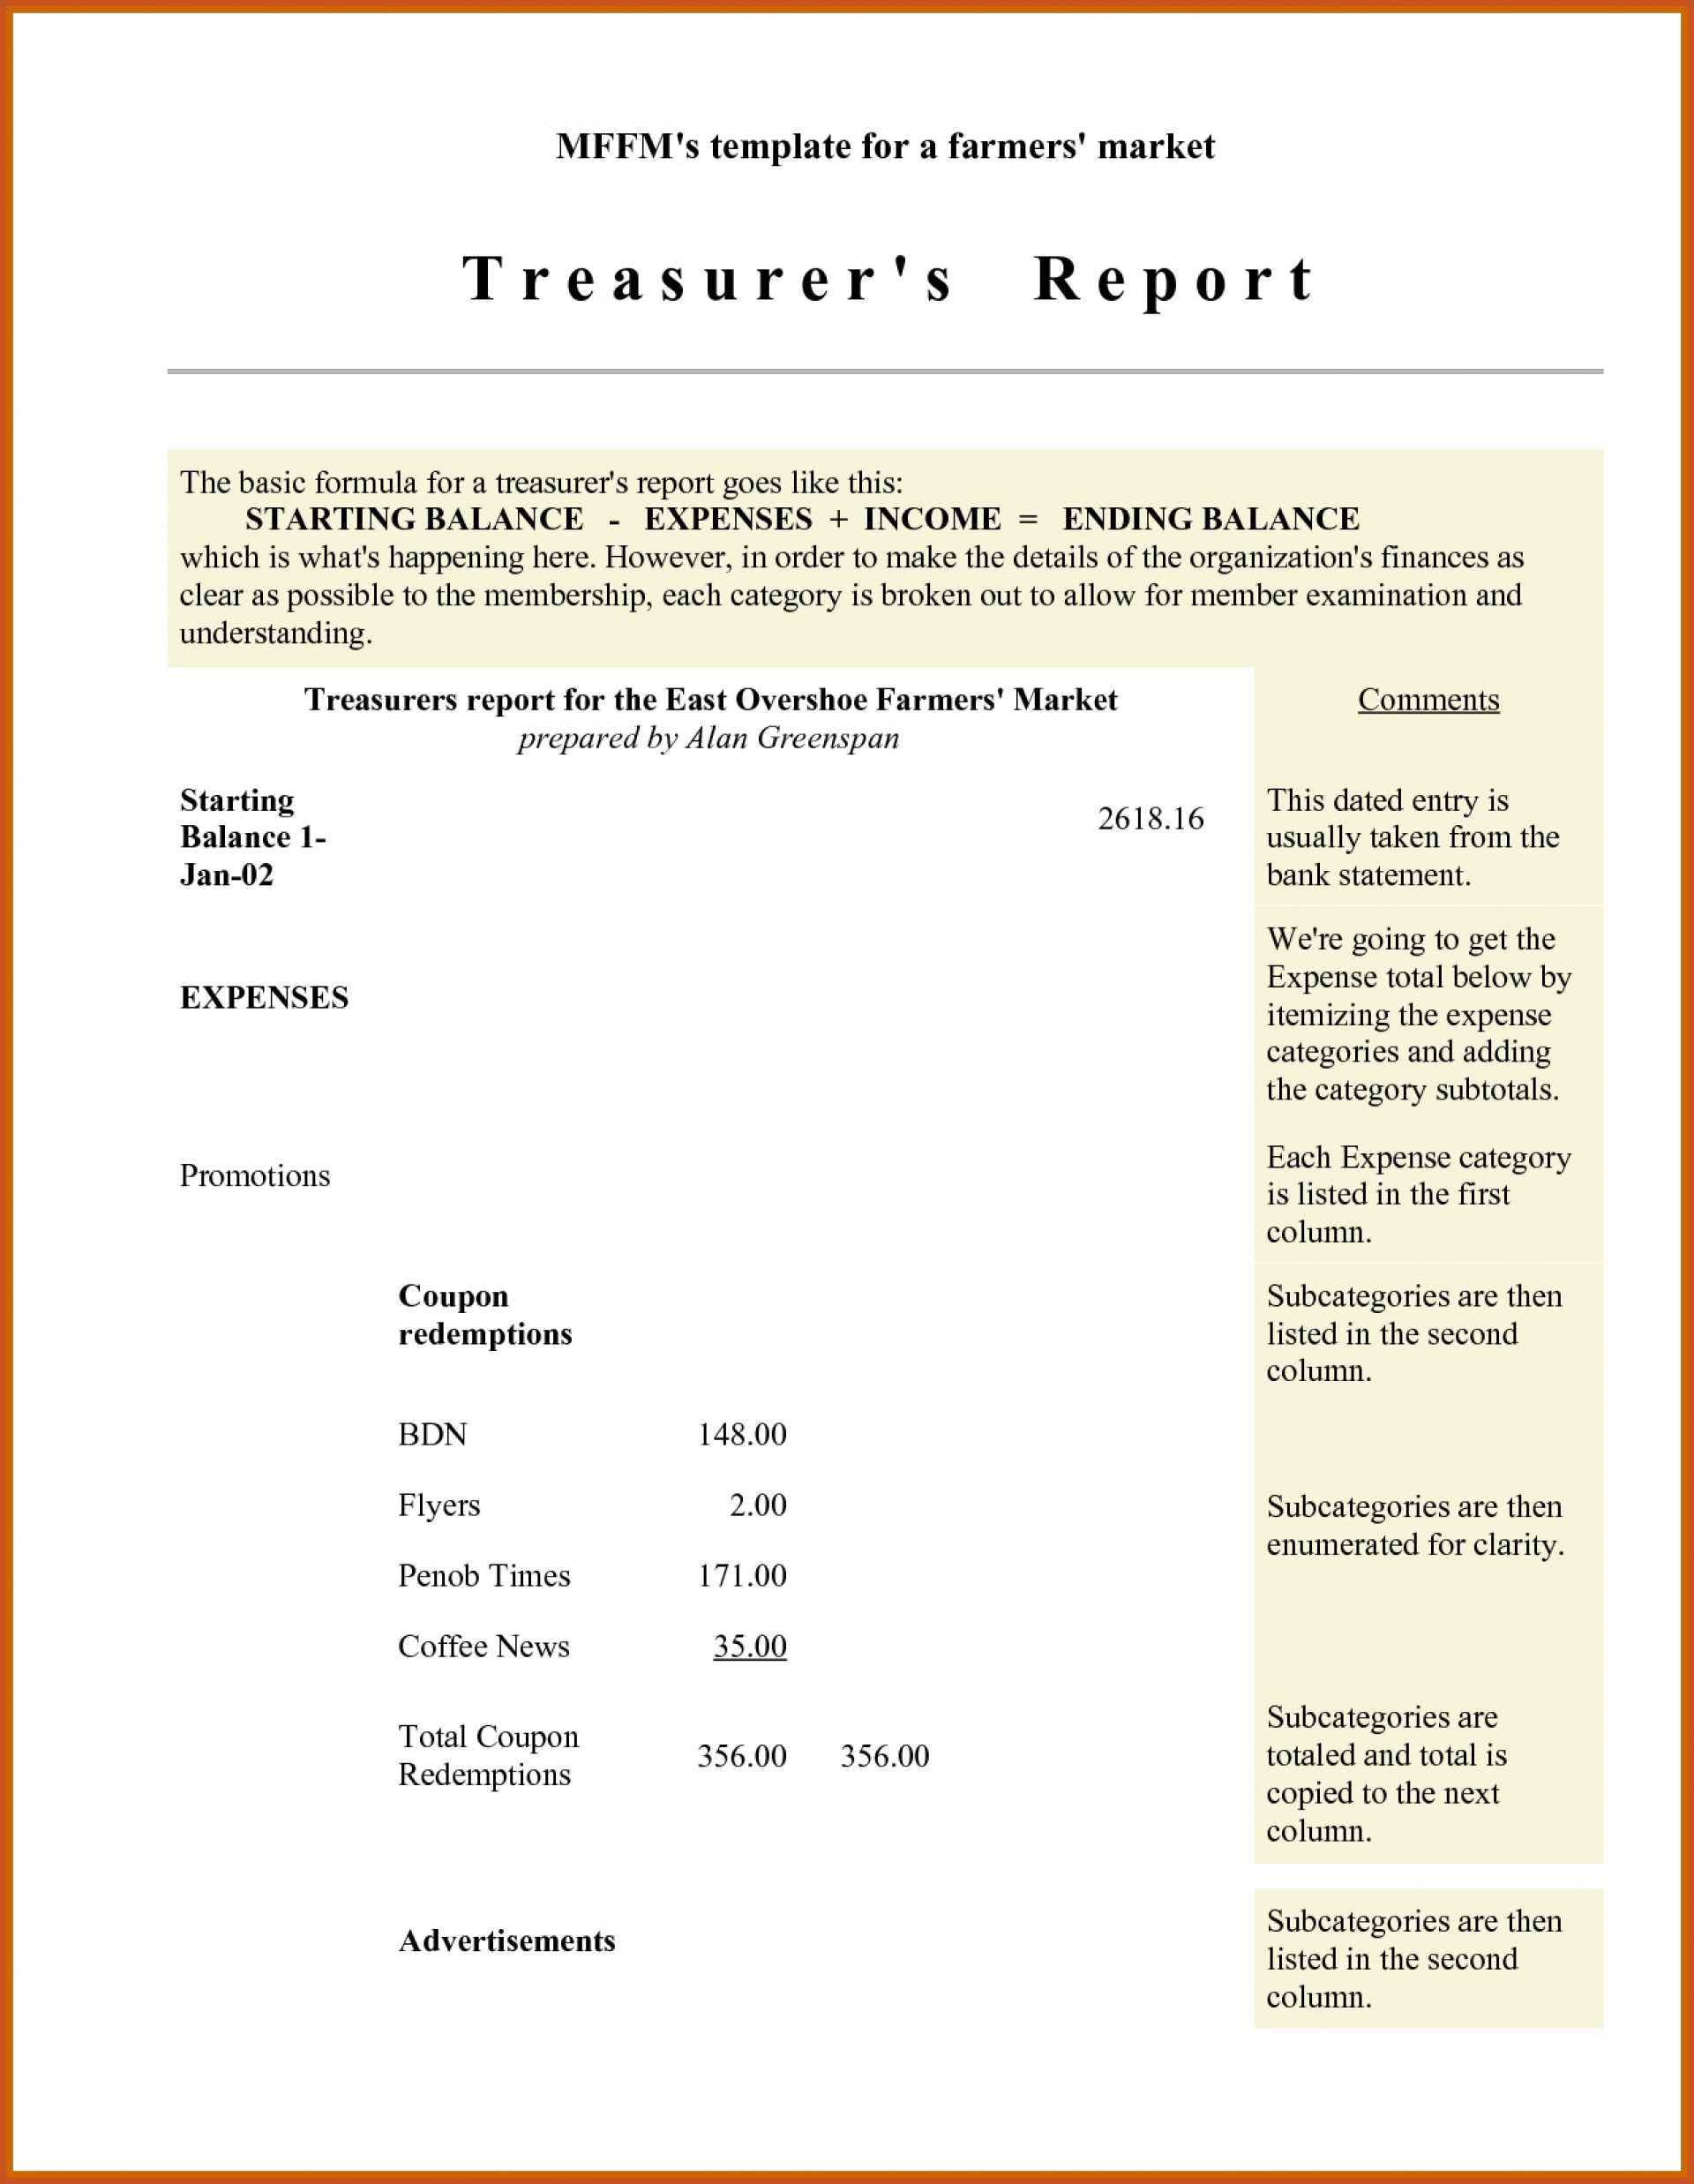 003 Treasurer Report Template Non Profit Sample Treasurers Pertaining To Treasurer Report Template Non Profit